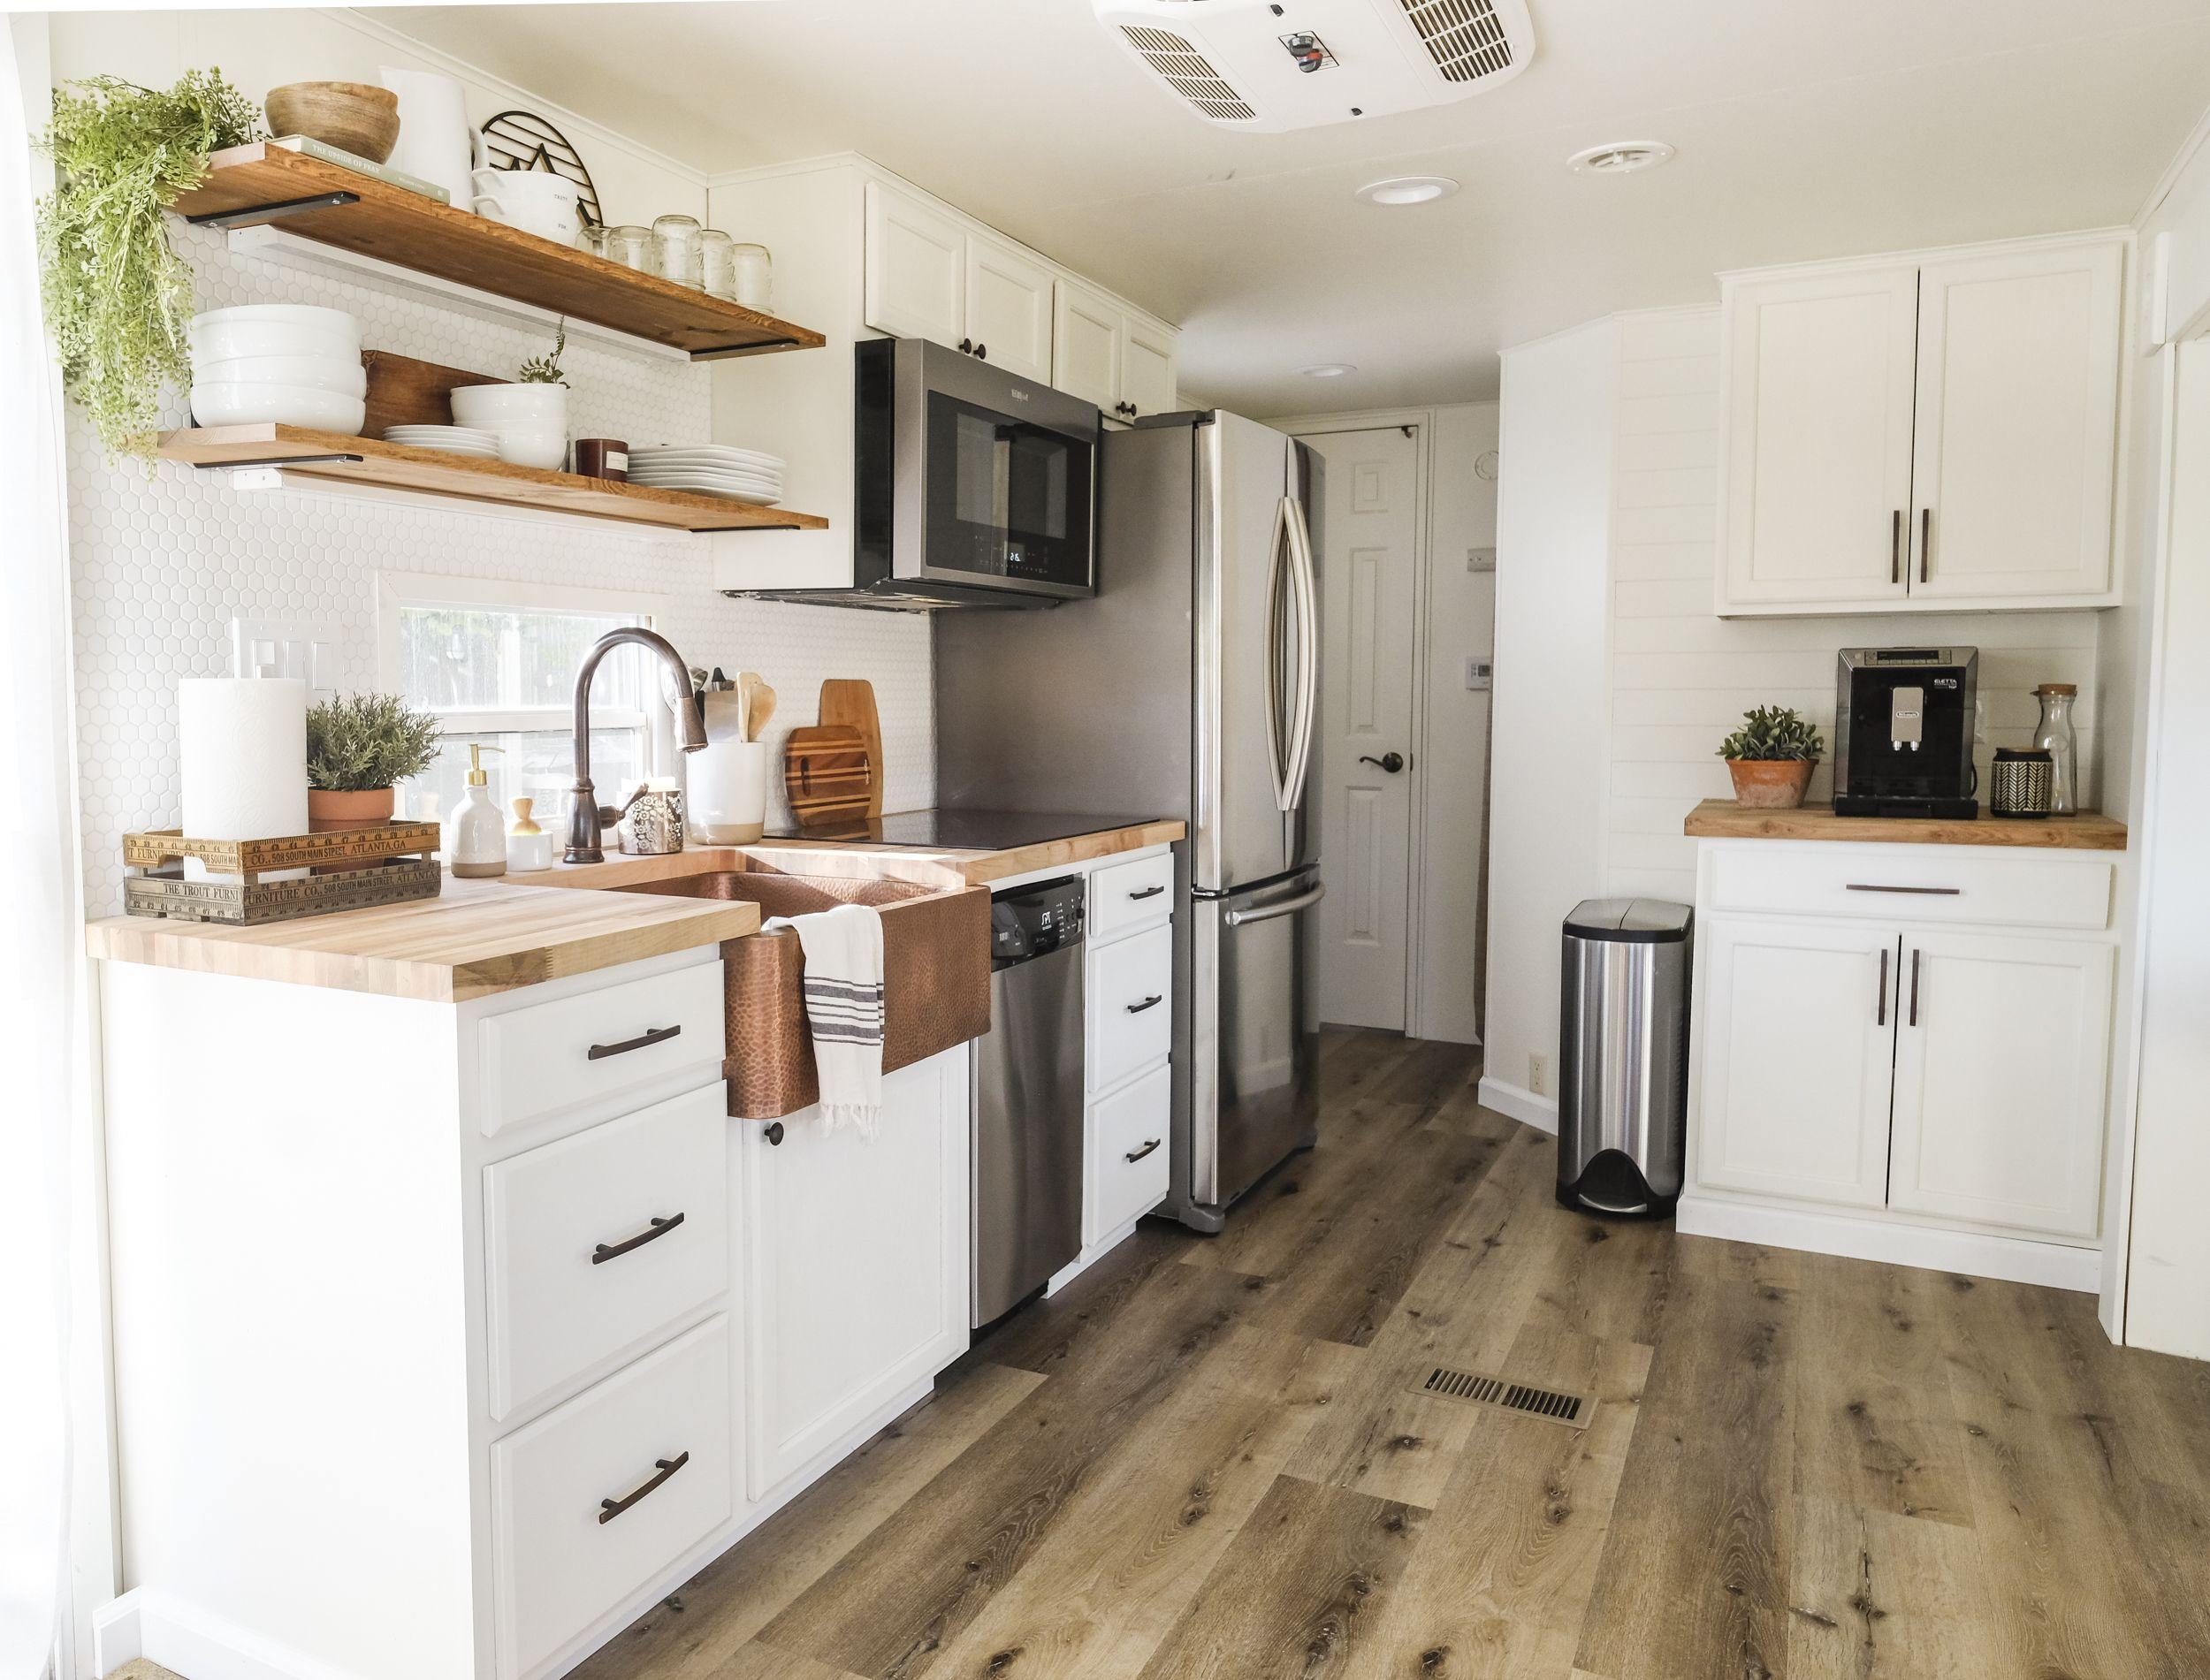 RV Kitchen Remodel Reveal   Rv kitchen remodel, Kitchen ...